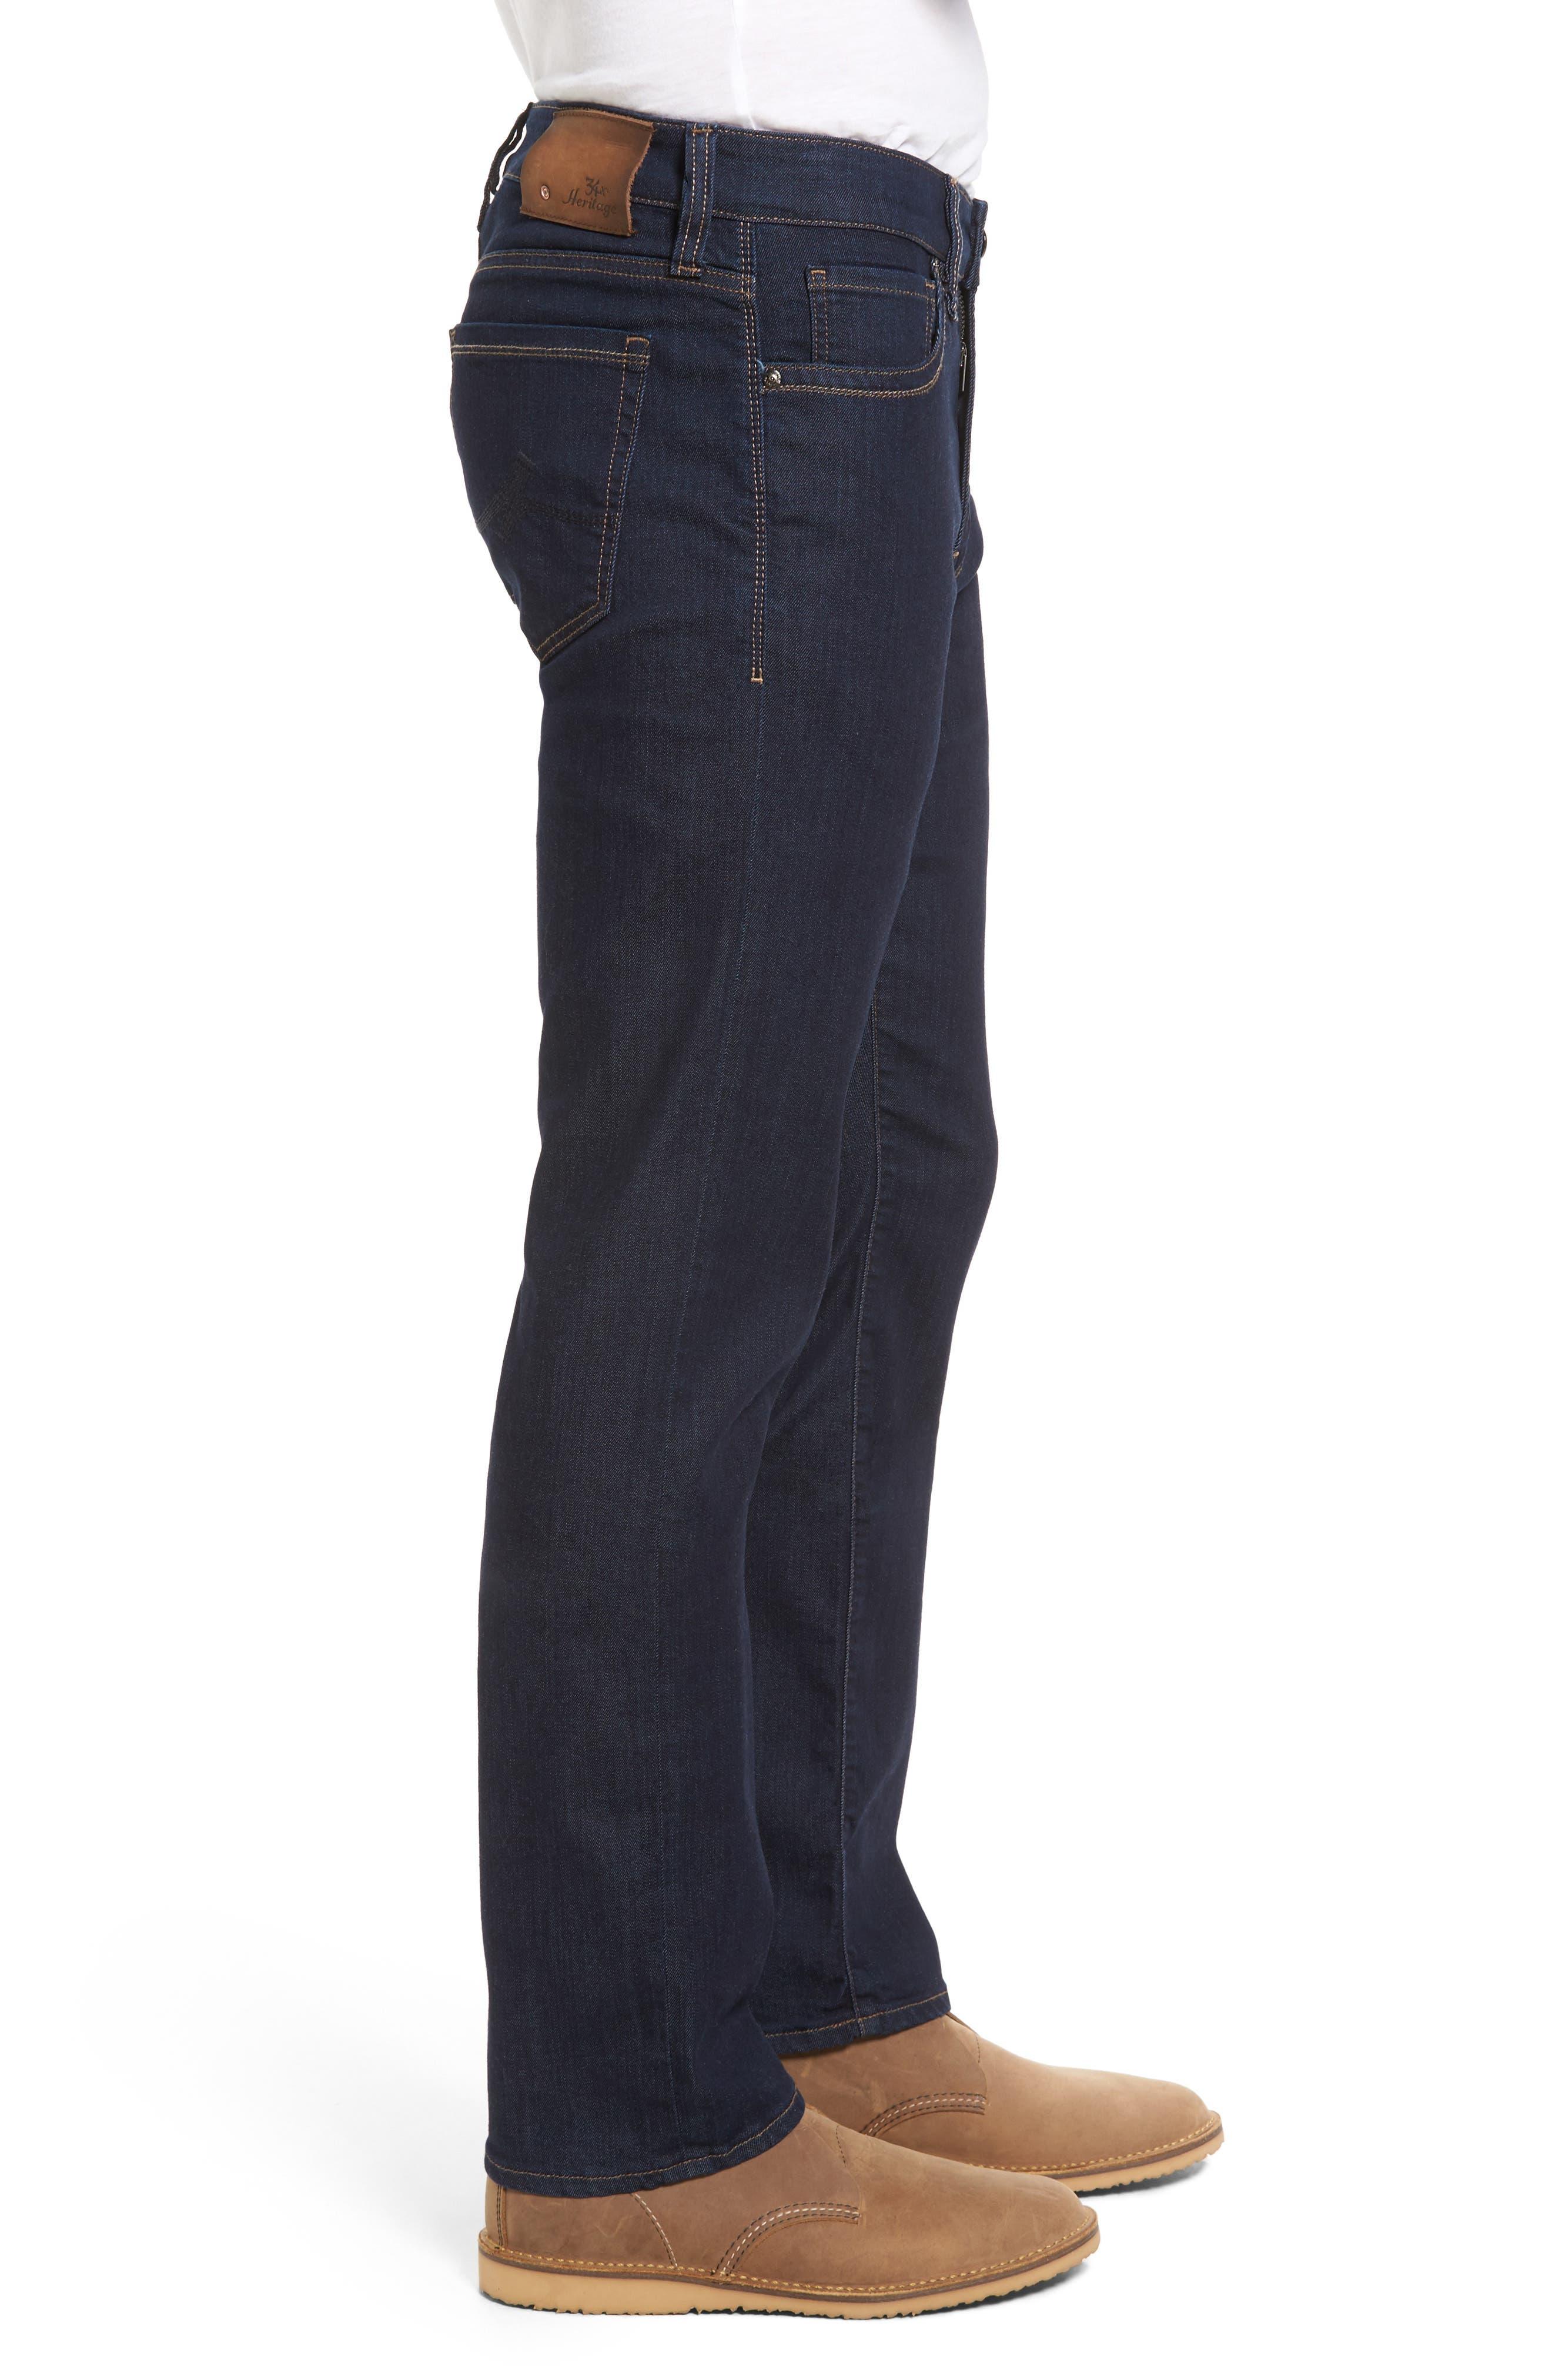 Courage Straight Leg Jeans,                             Alternate thumbnail 3, color,                             RINSE VINTAGE